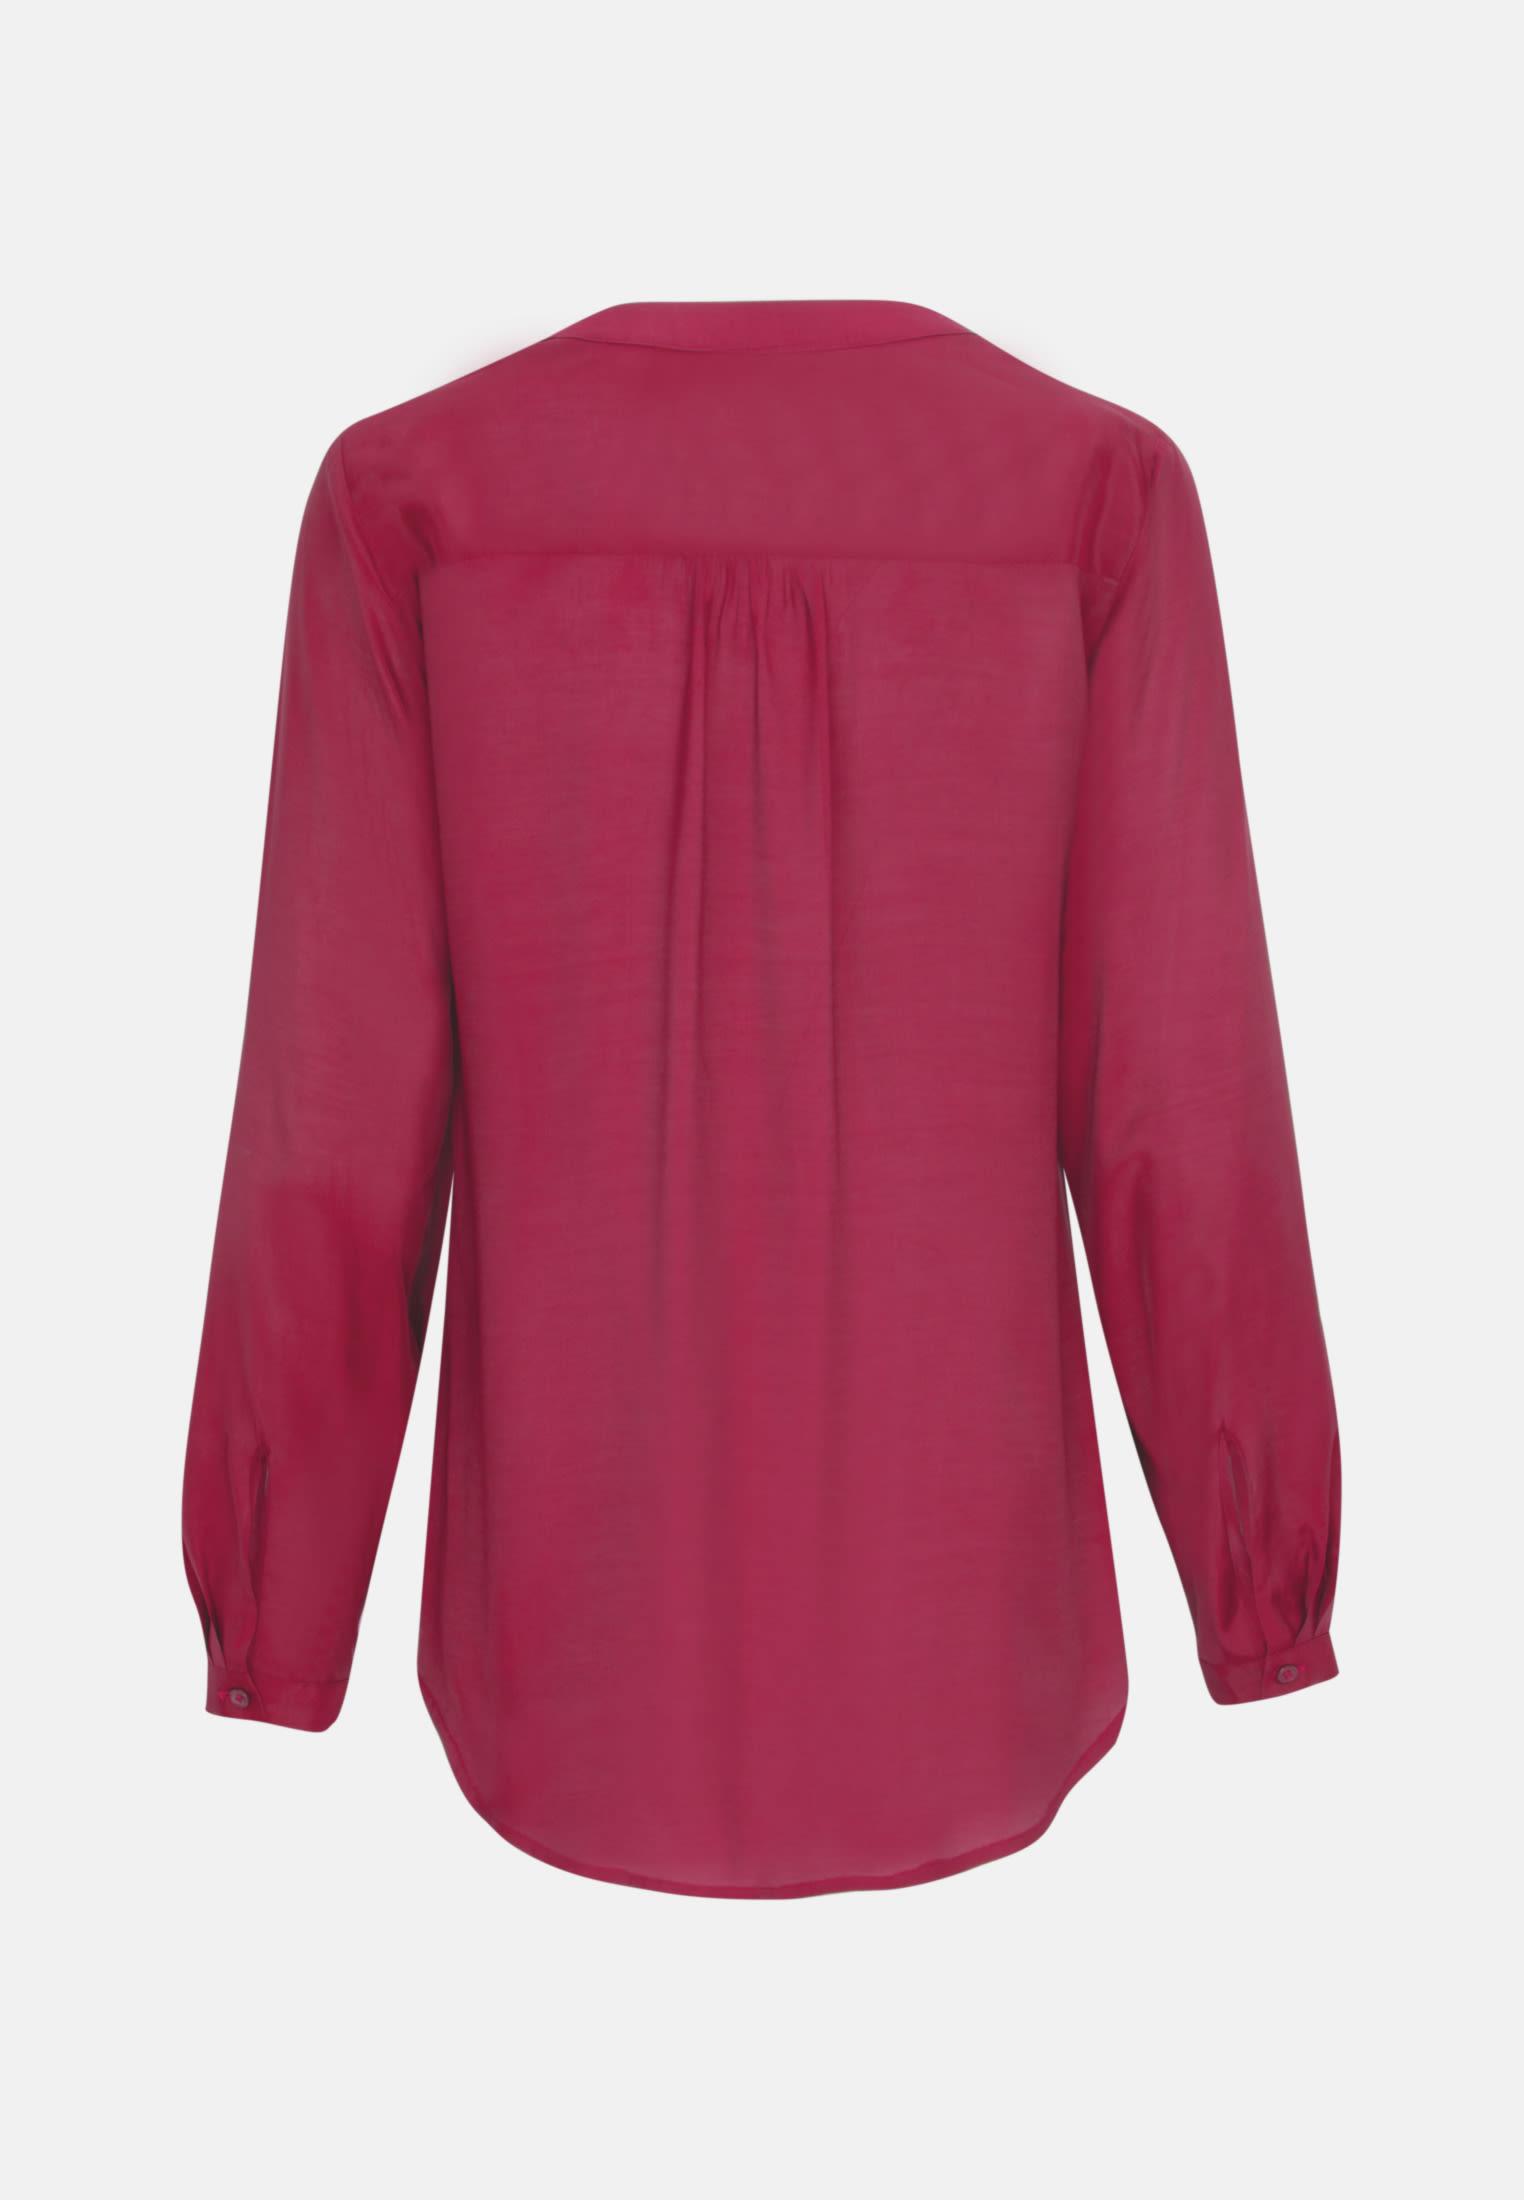 Voile Tunic made of 100% Viscose in Red |  Seidensticker Onlineshop